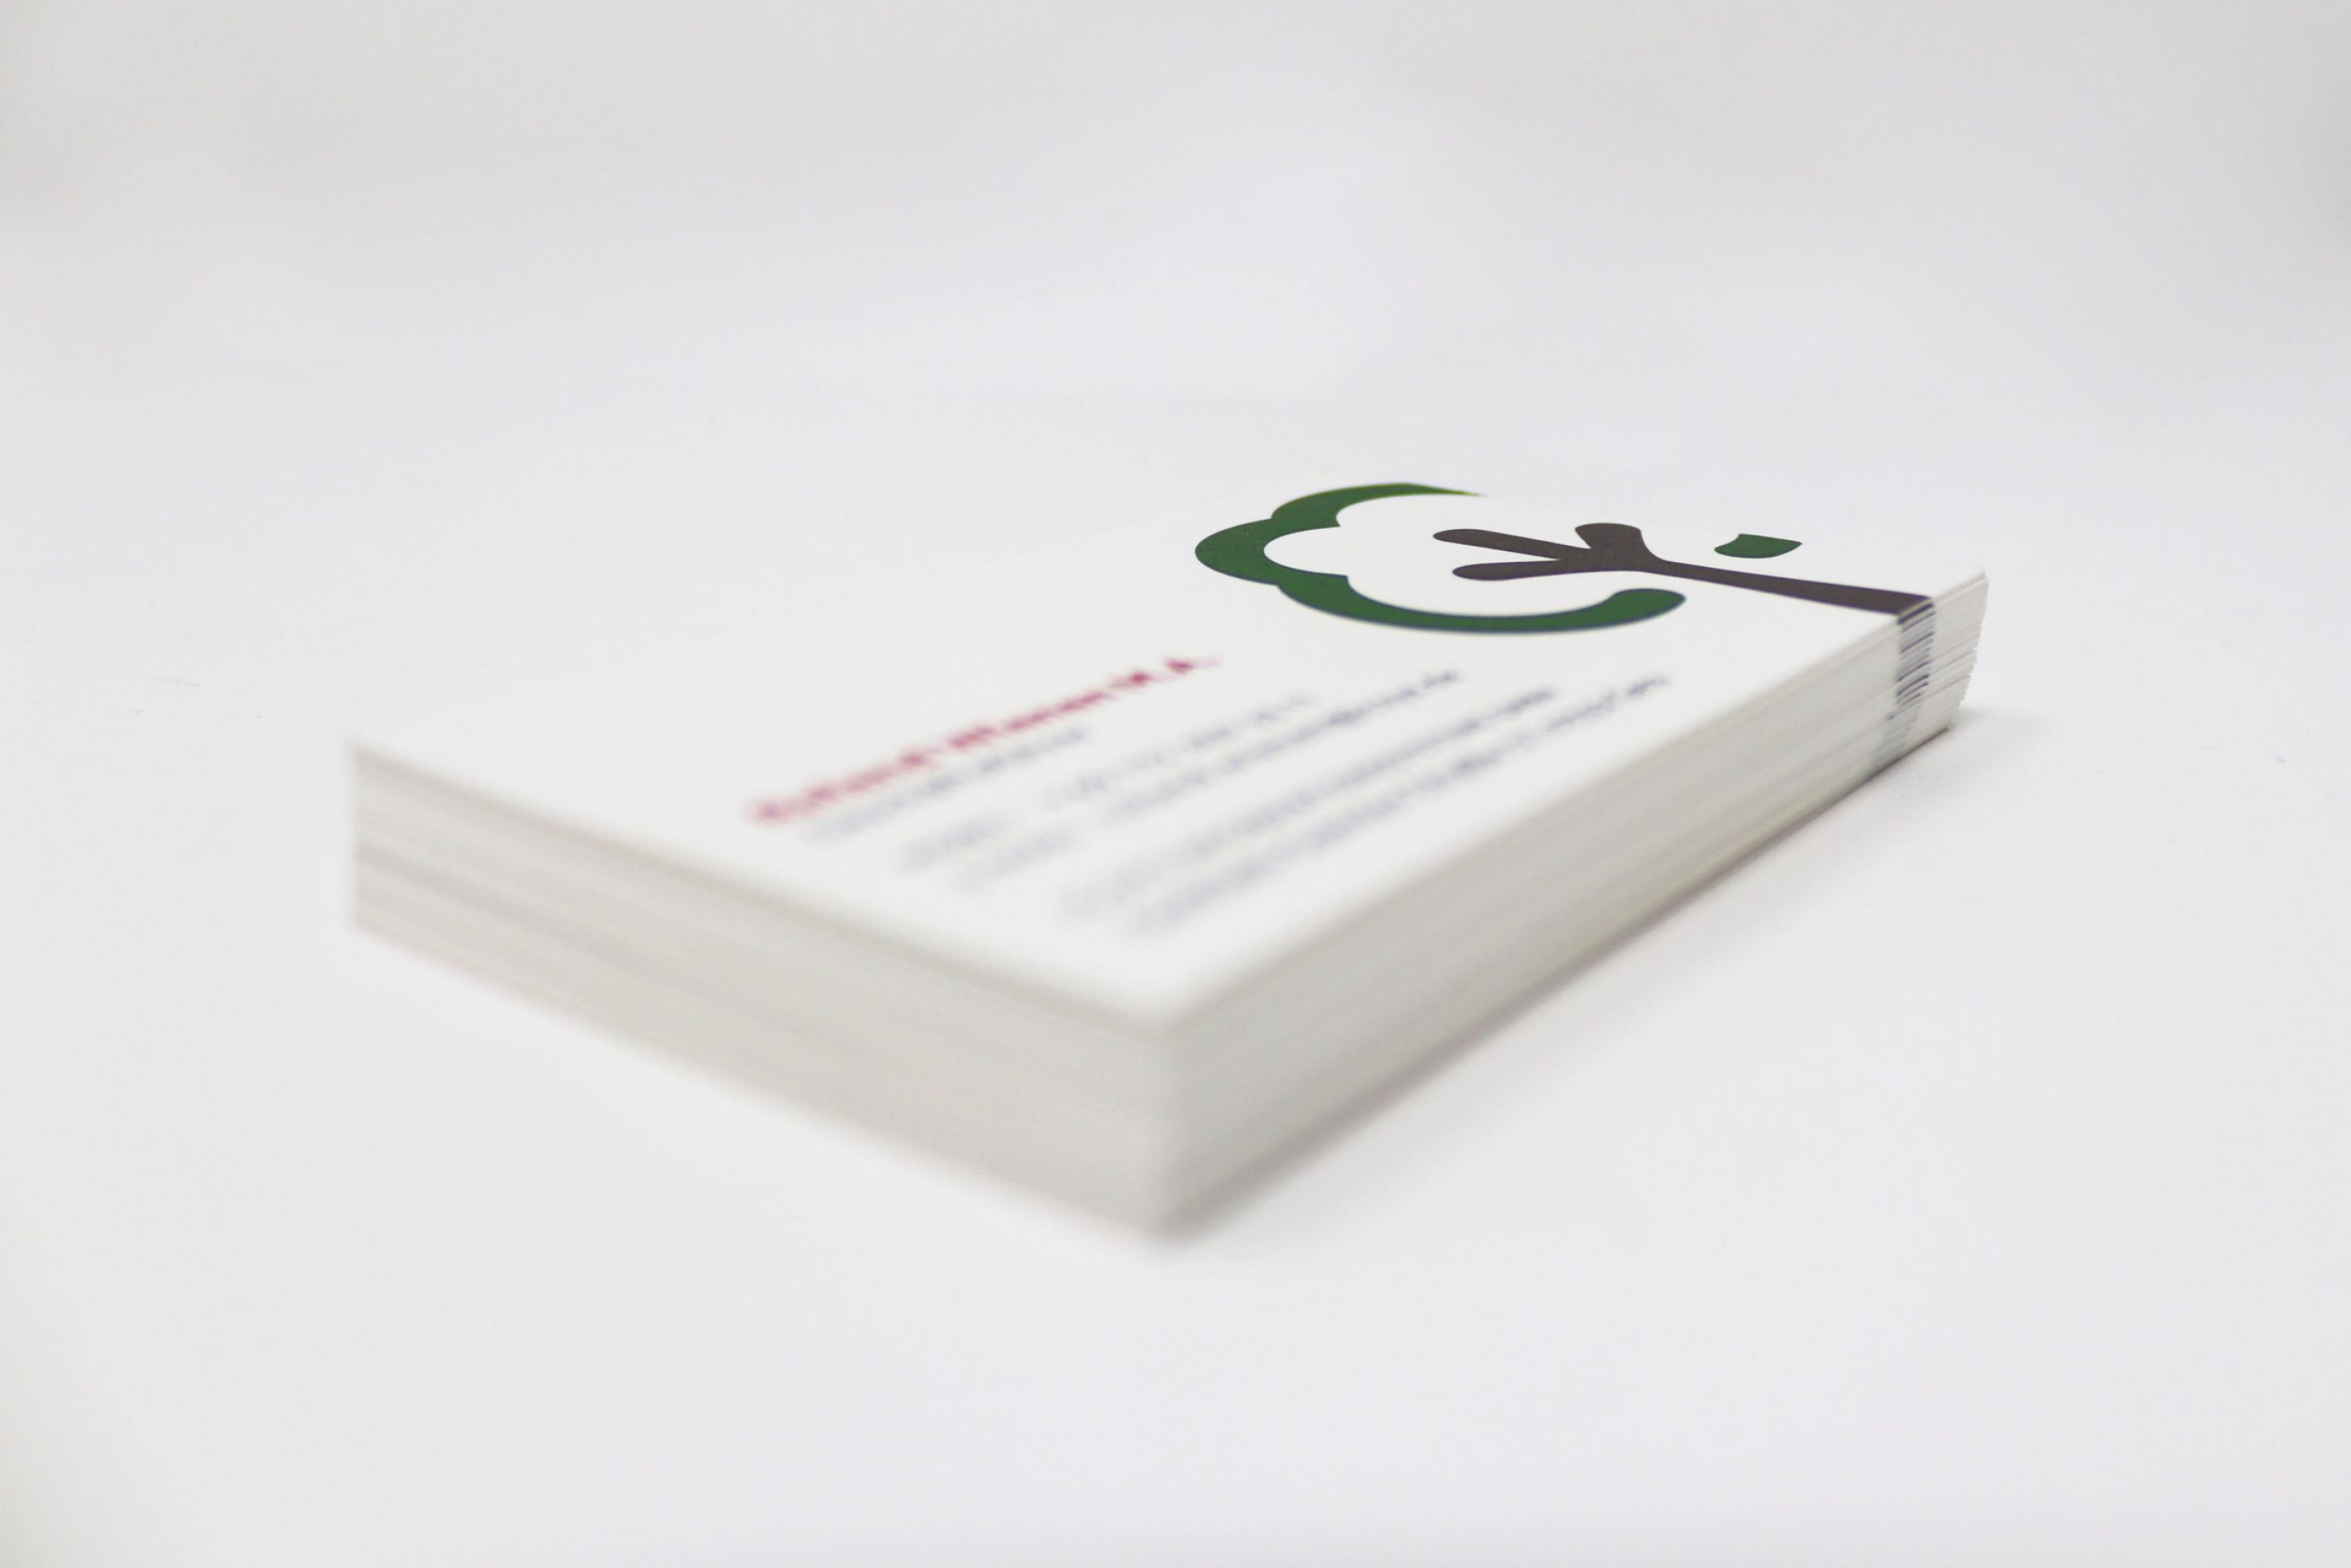 Neue Visitenkarten Für Profsys Formlos Berlin